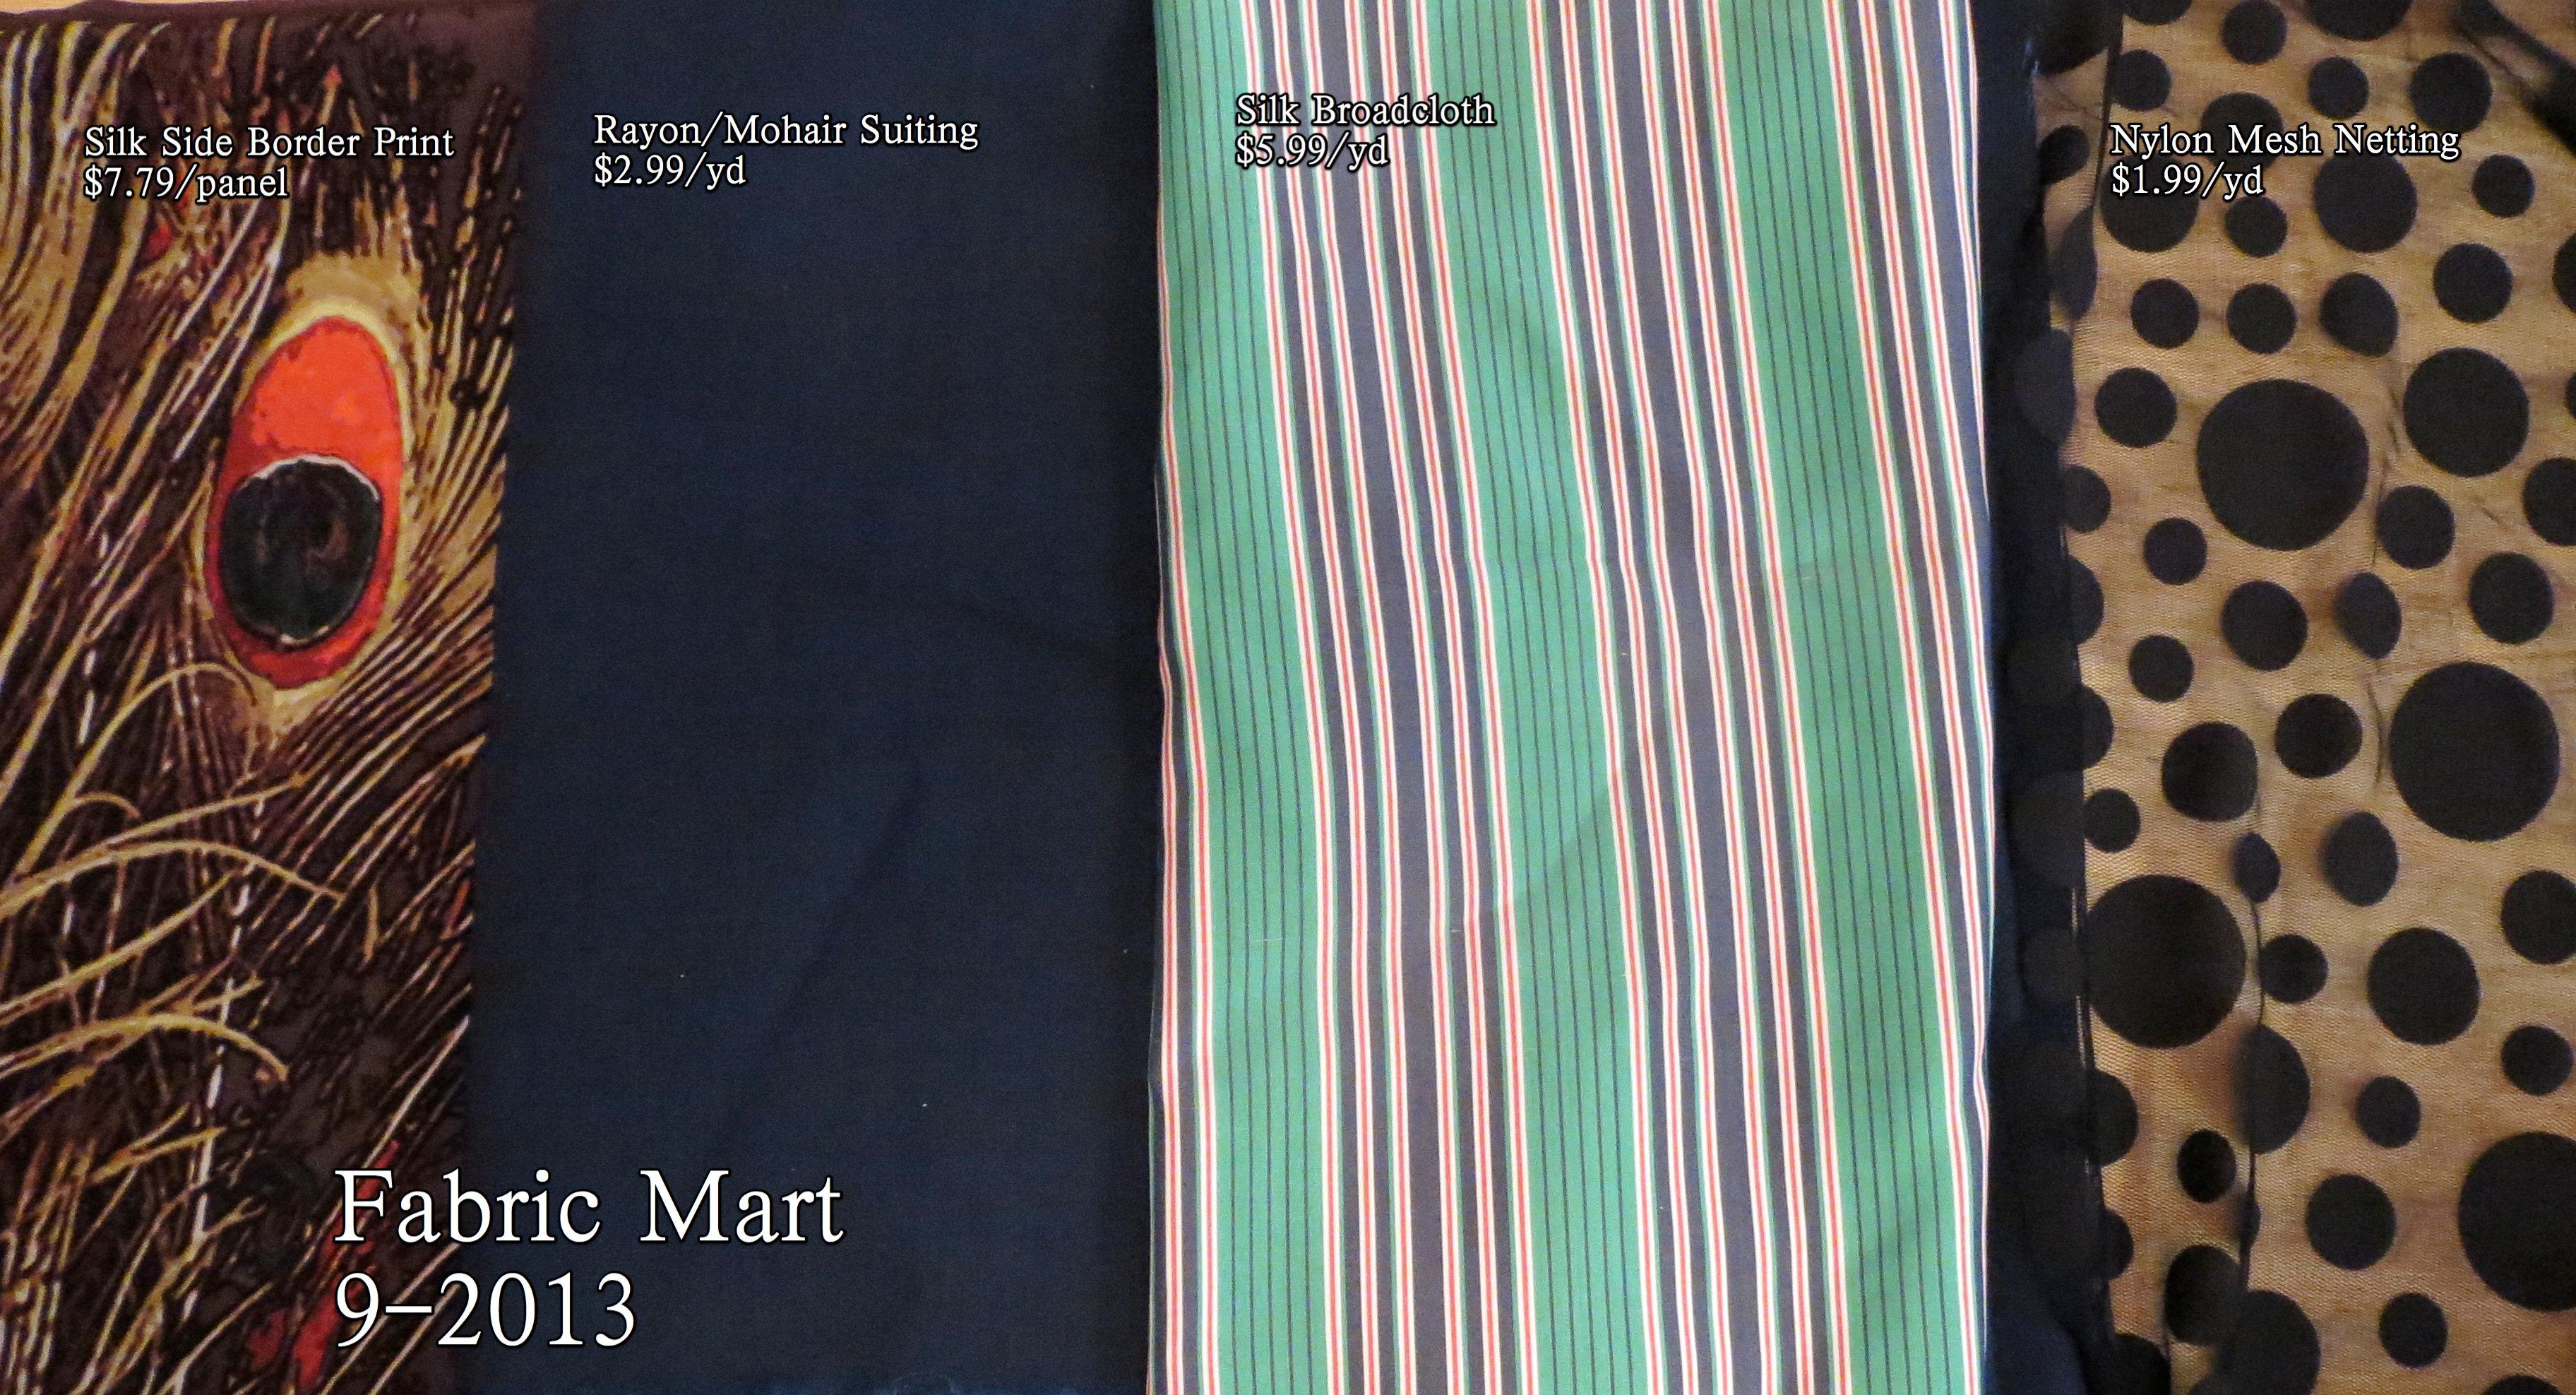 Fabric Mart 9-2013